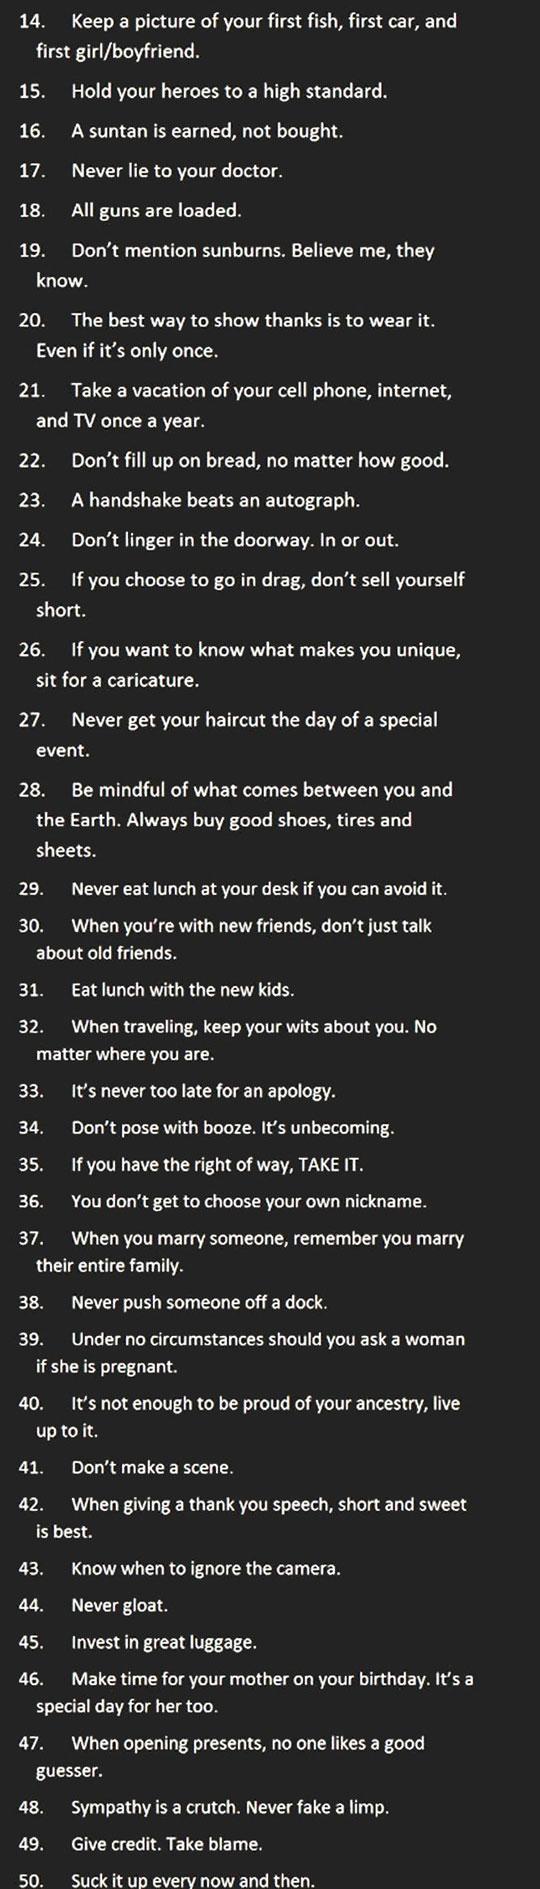 funny-teacher-highschool-wise-words-sense